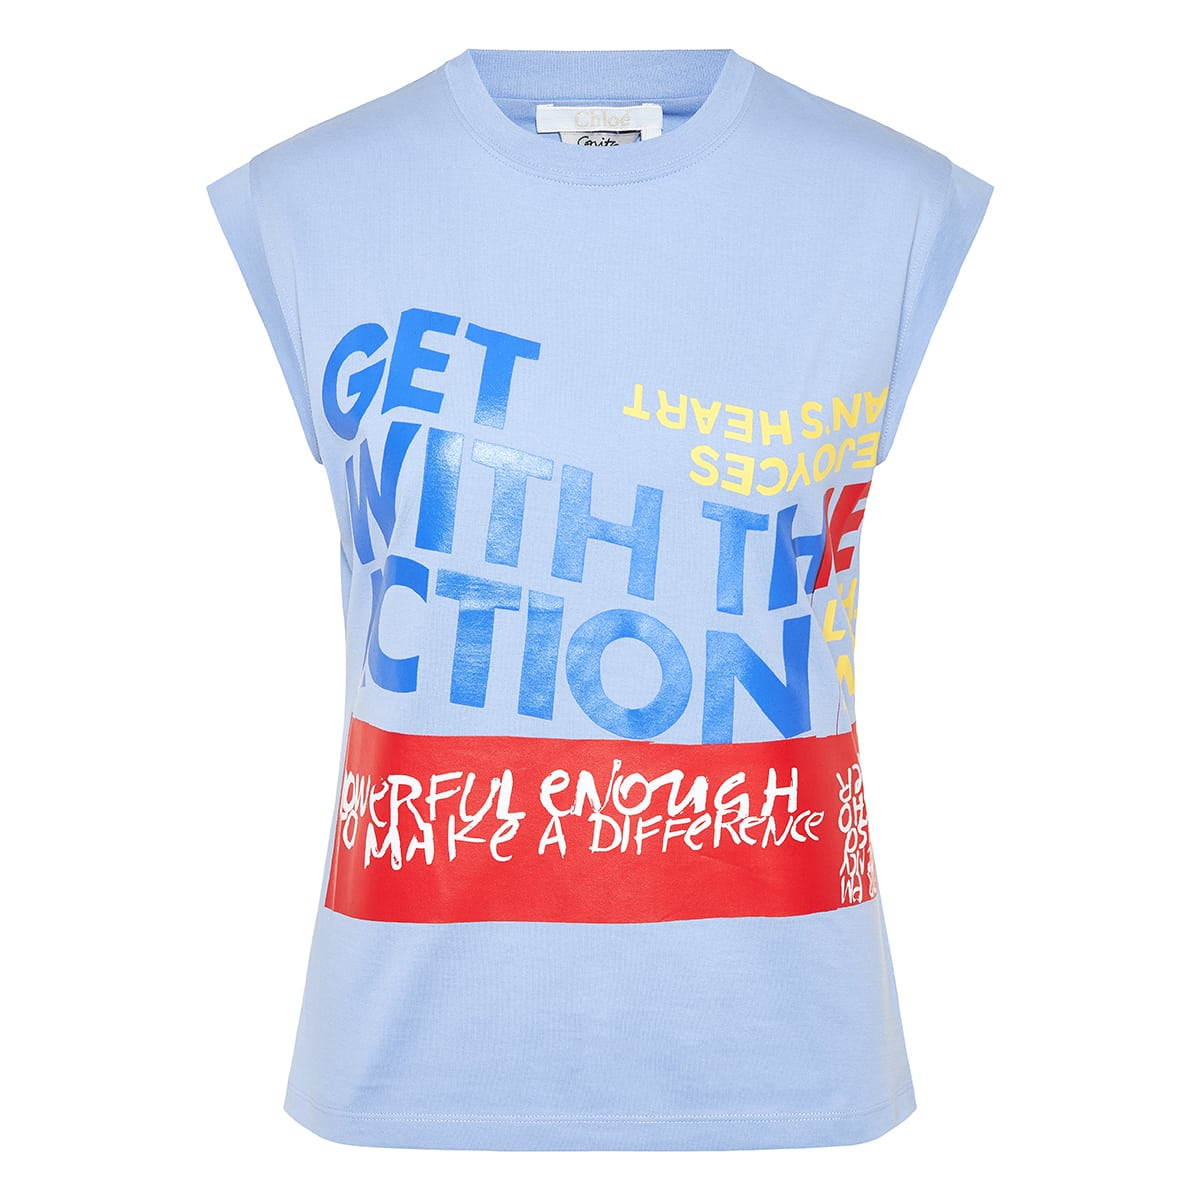 Corita Kent graphic t-shirt